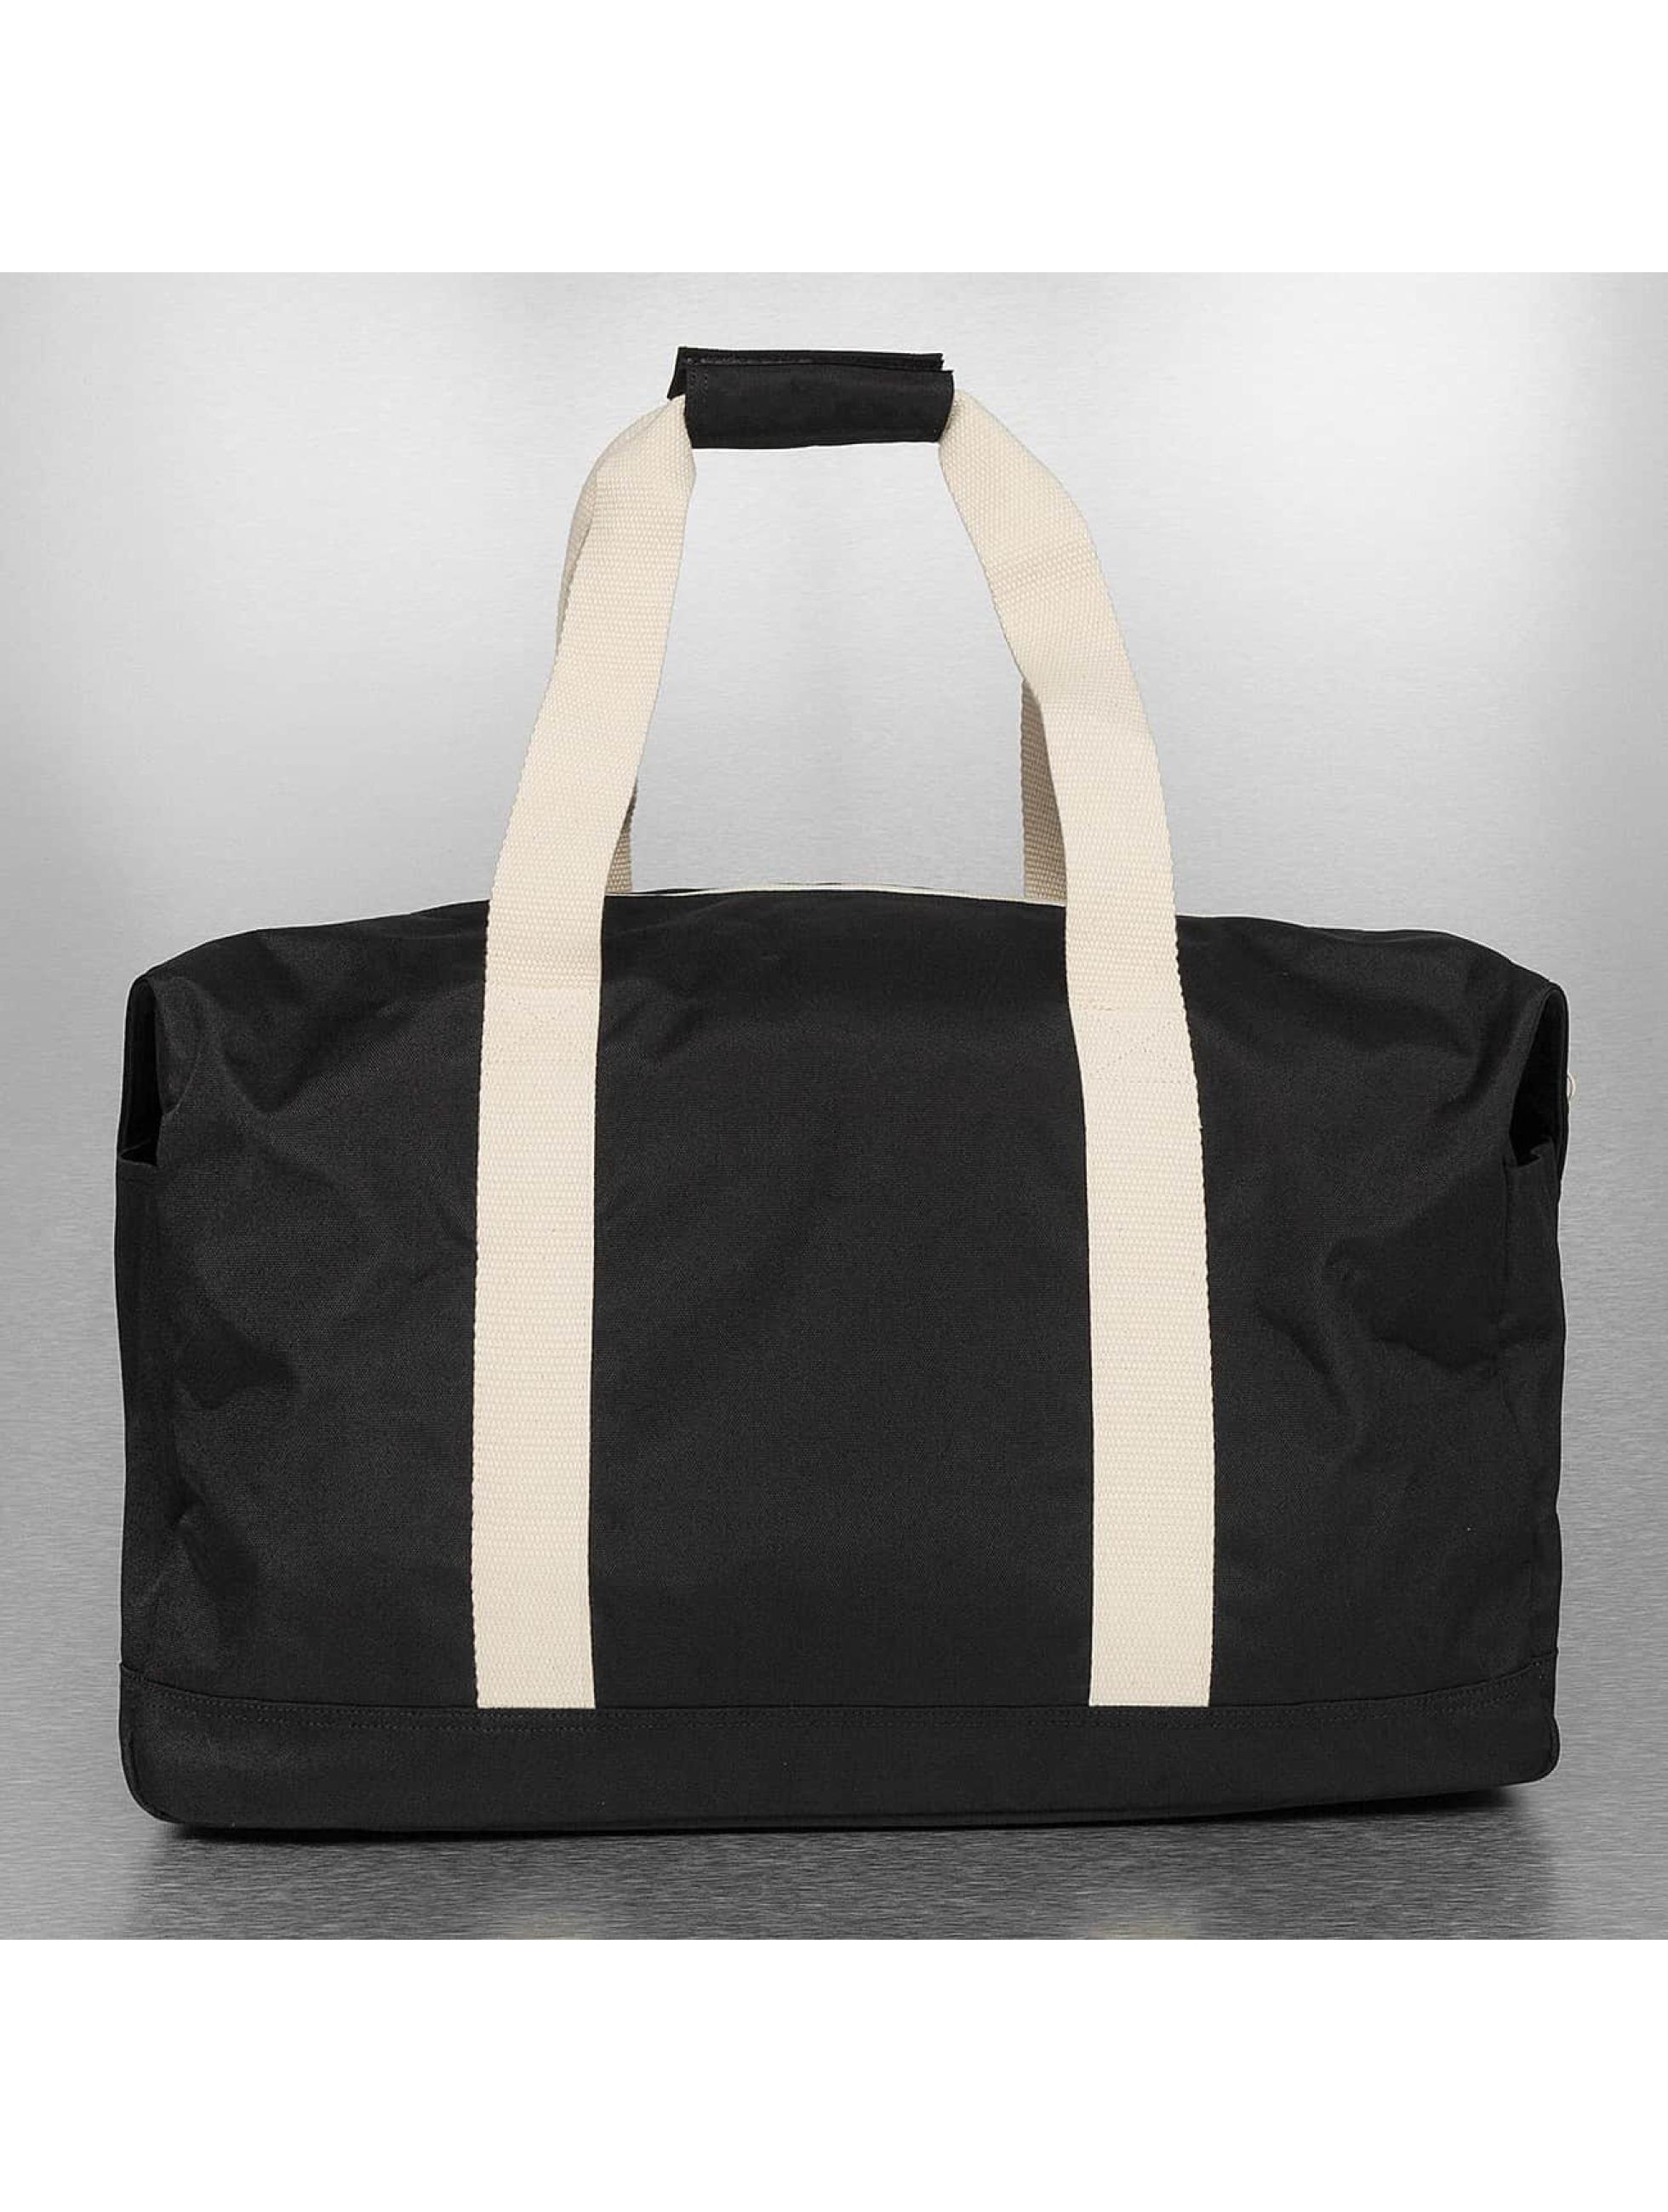 Carhartt WIP Bag Watch Sport black